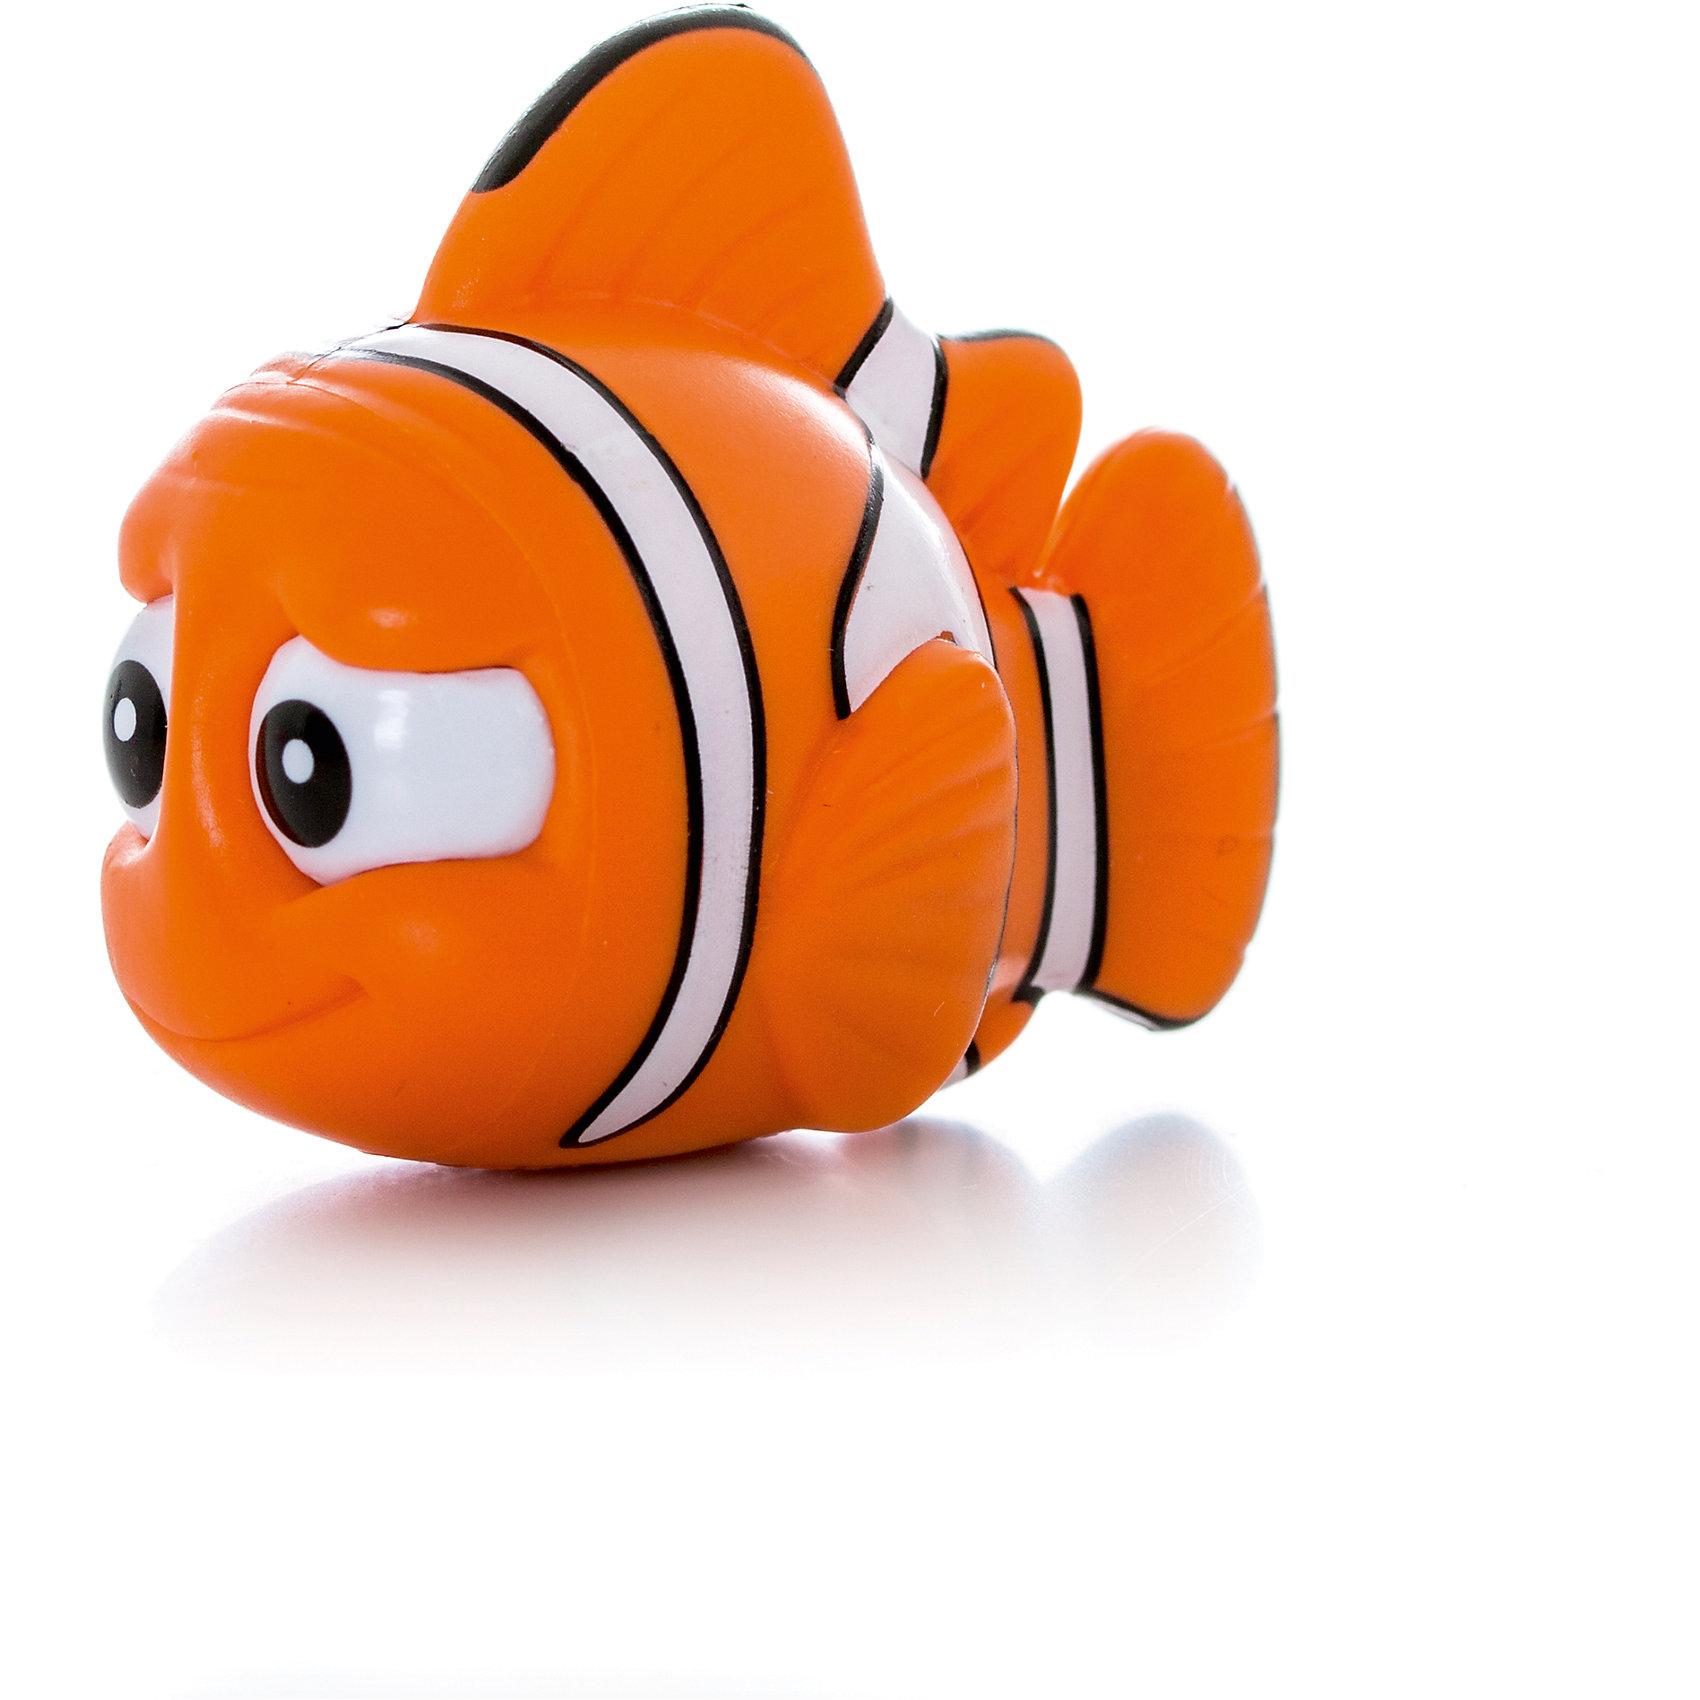 Фигурка подводного обитателя